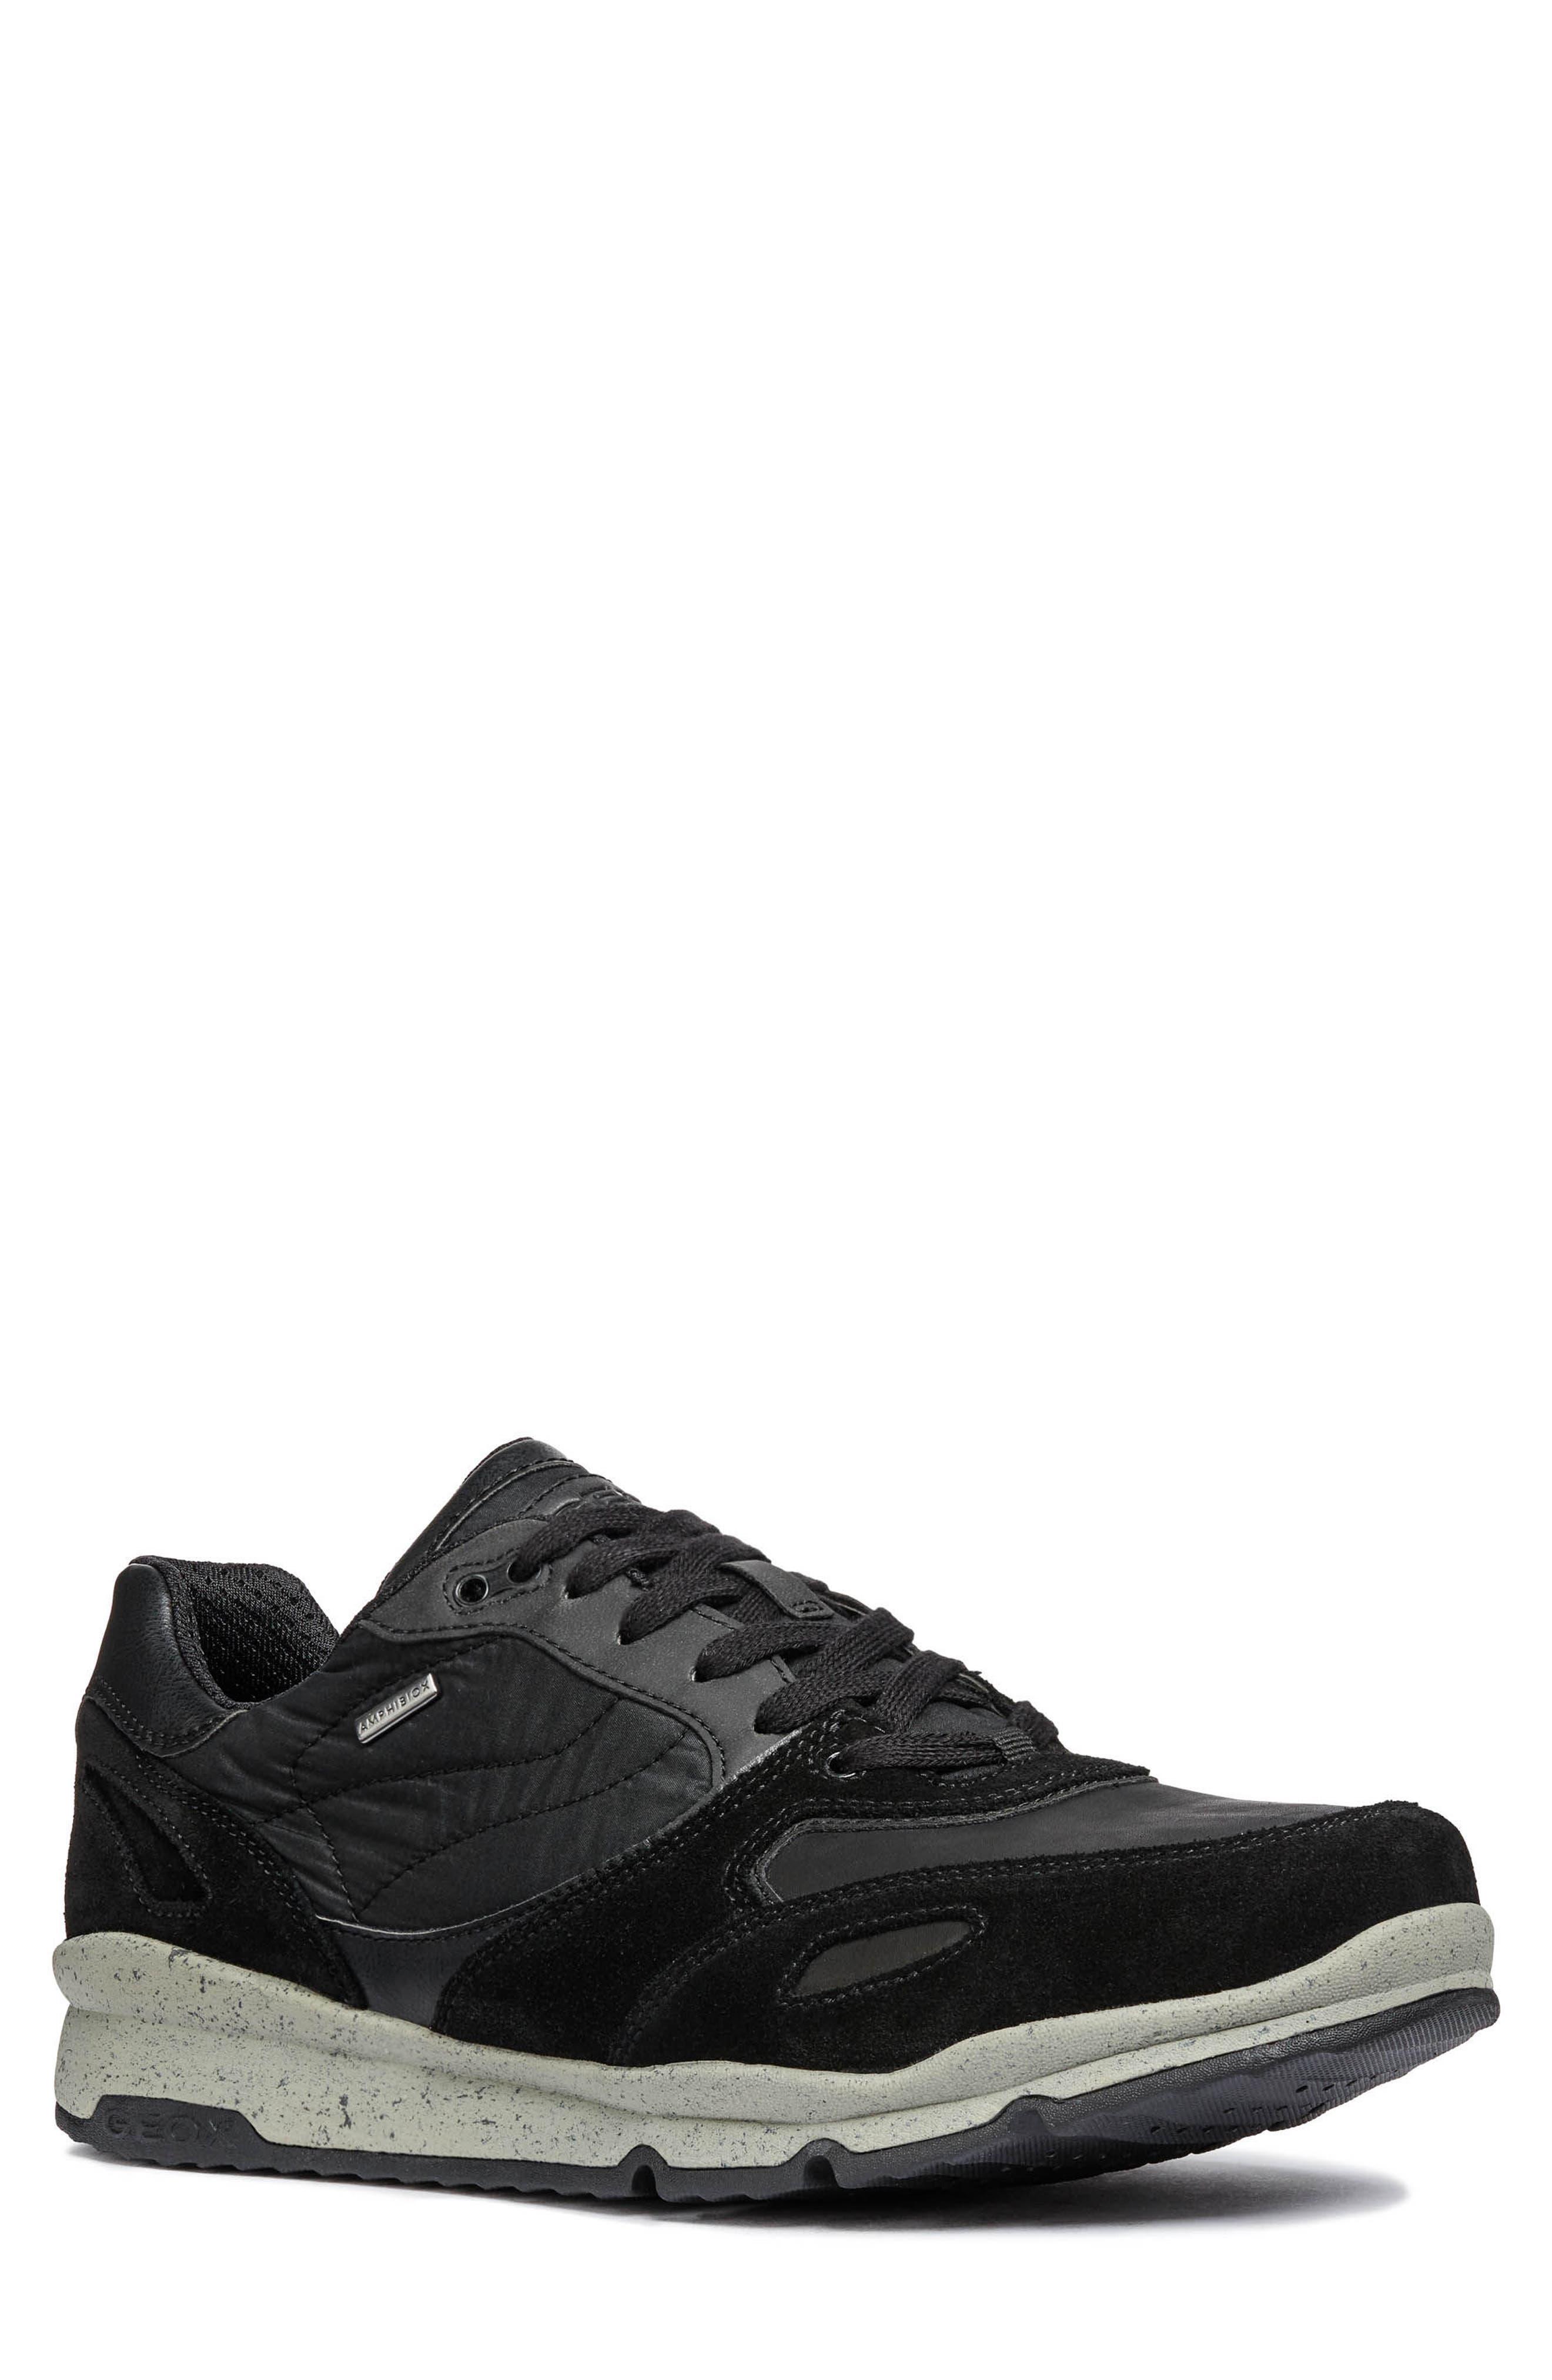 Sandro ABX Ambphibiox Waterproof Sneaker,                         Main,                         color, 007